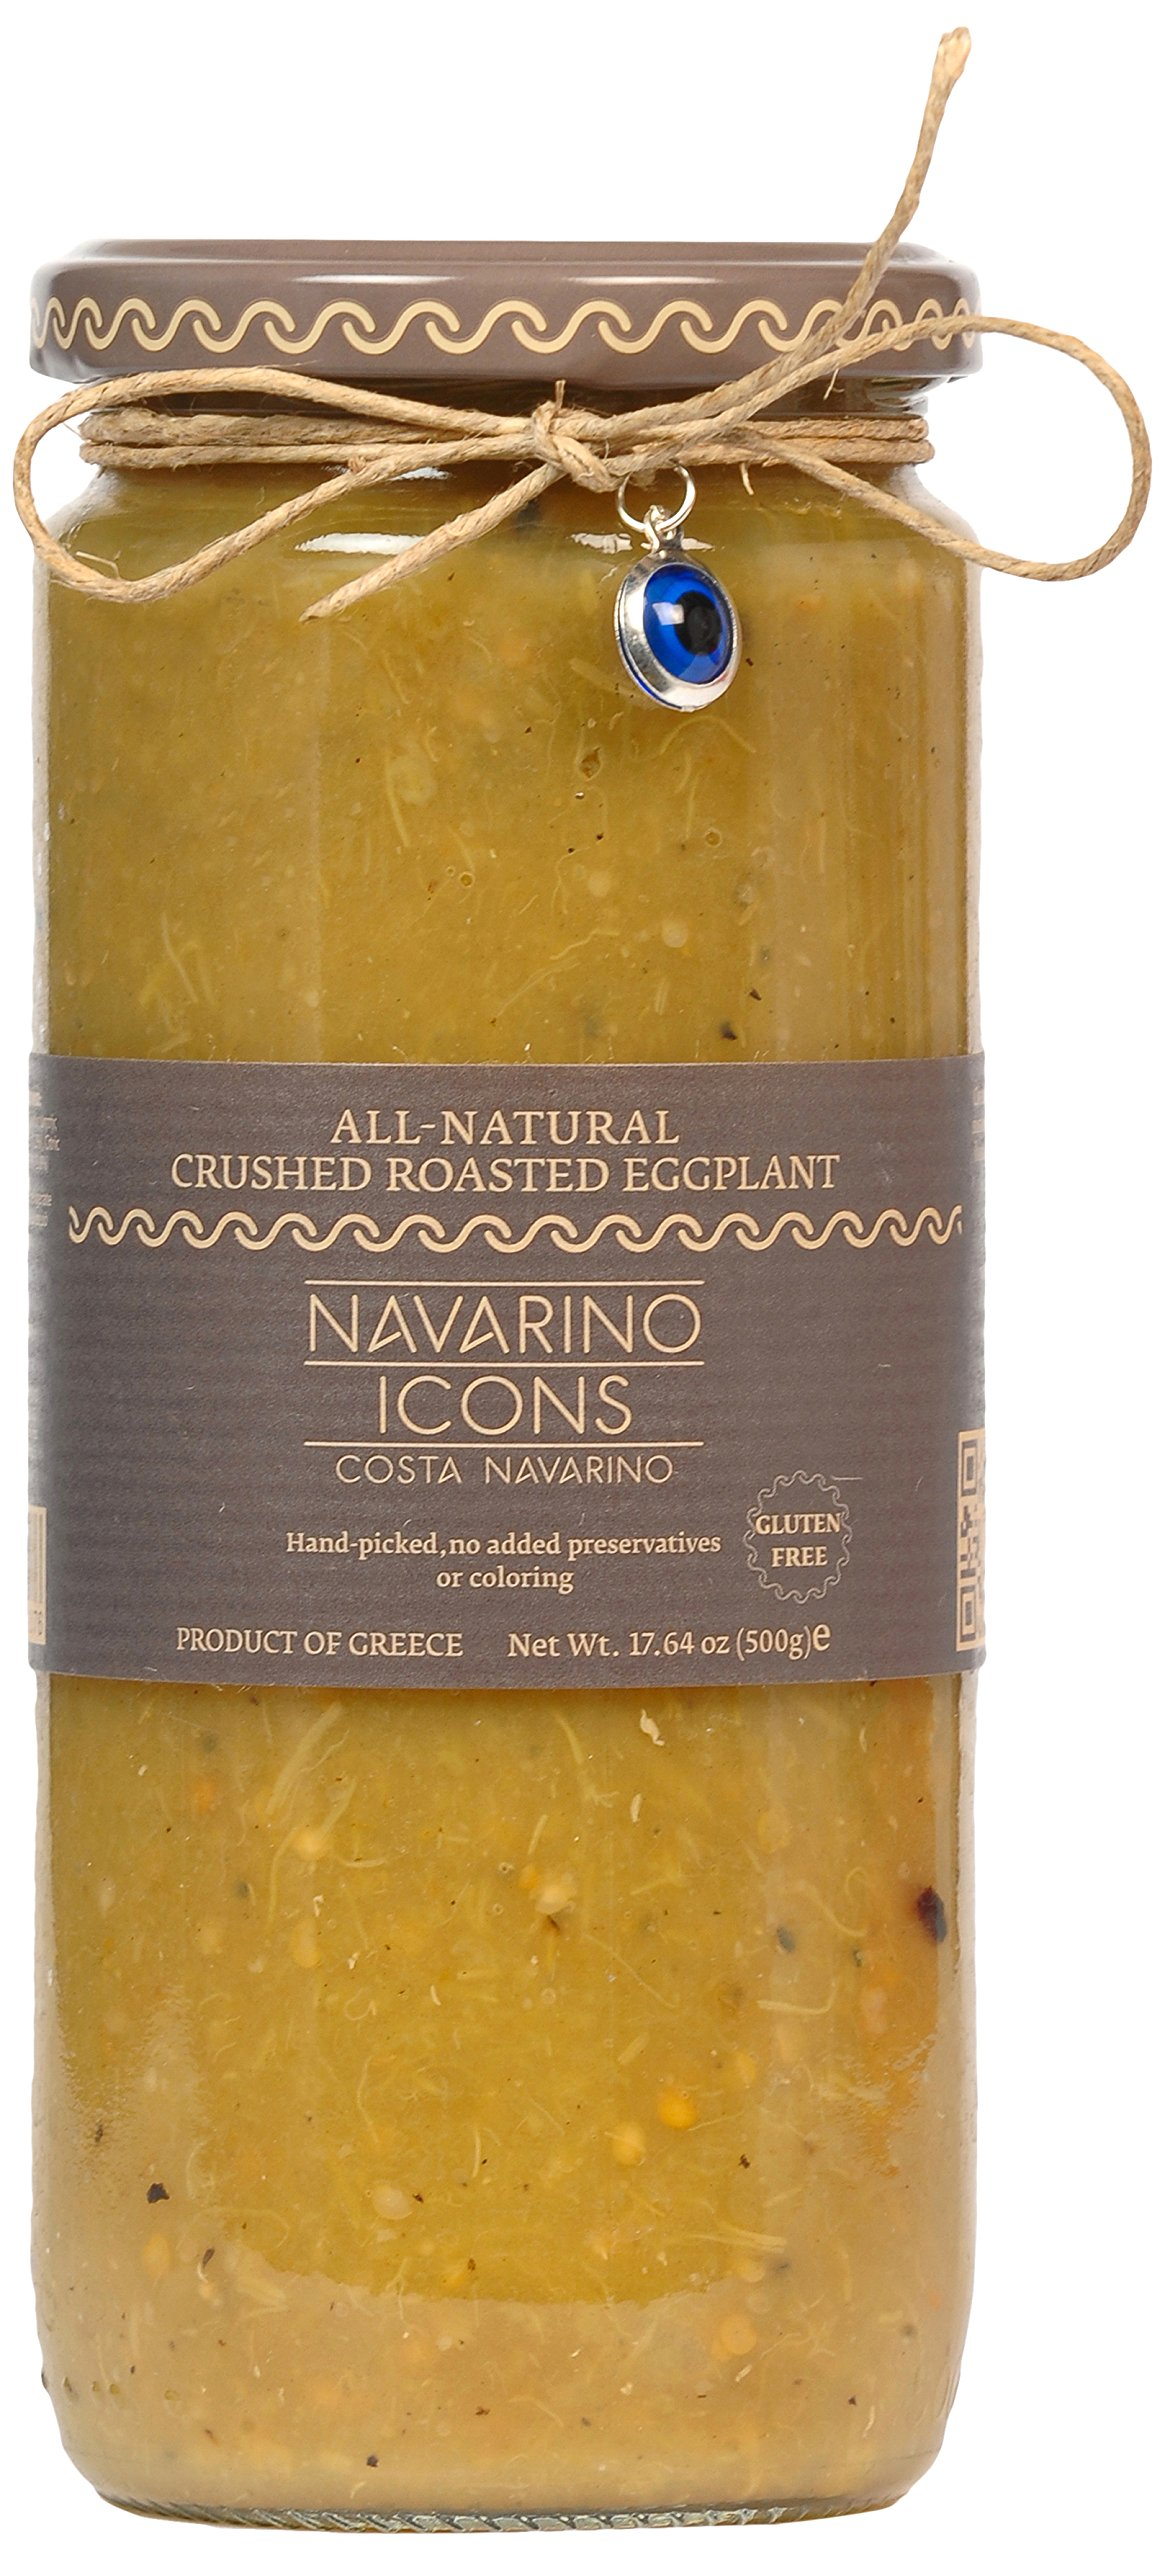 NAVARINO ICONS All-Natural Crushed Eggplant Puree, 17 Ounce